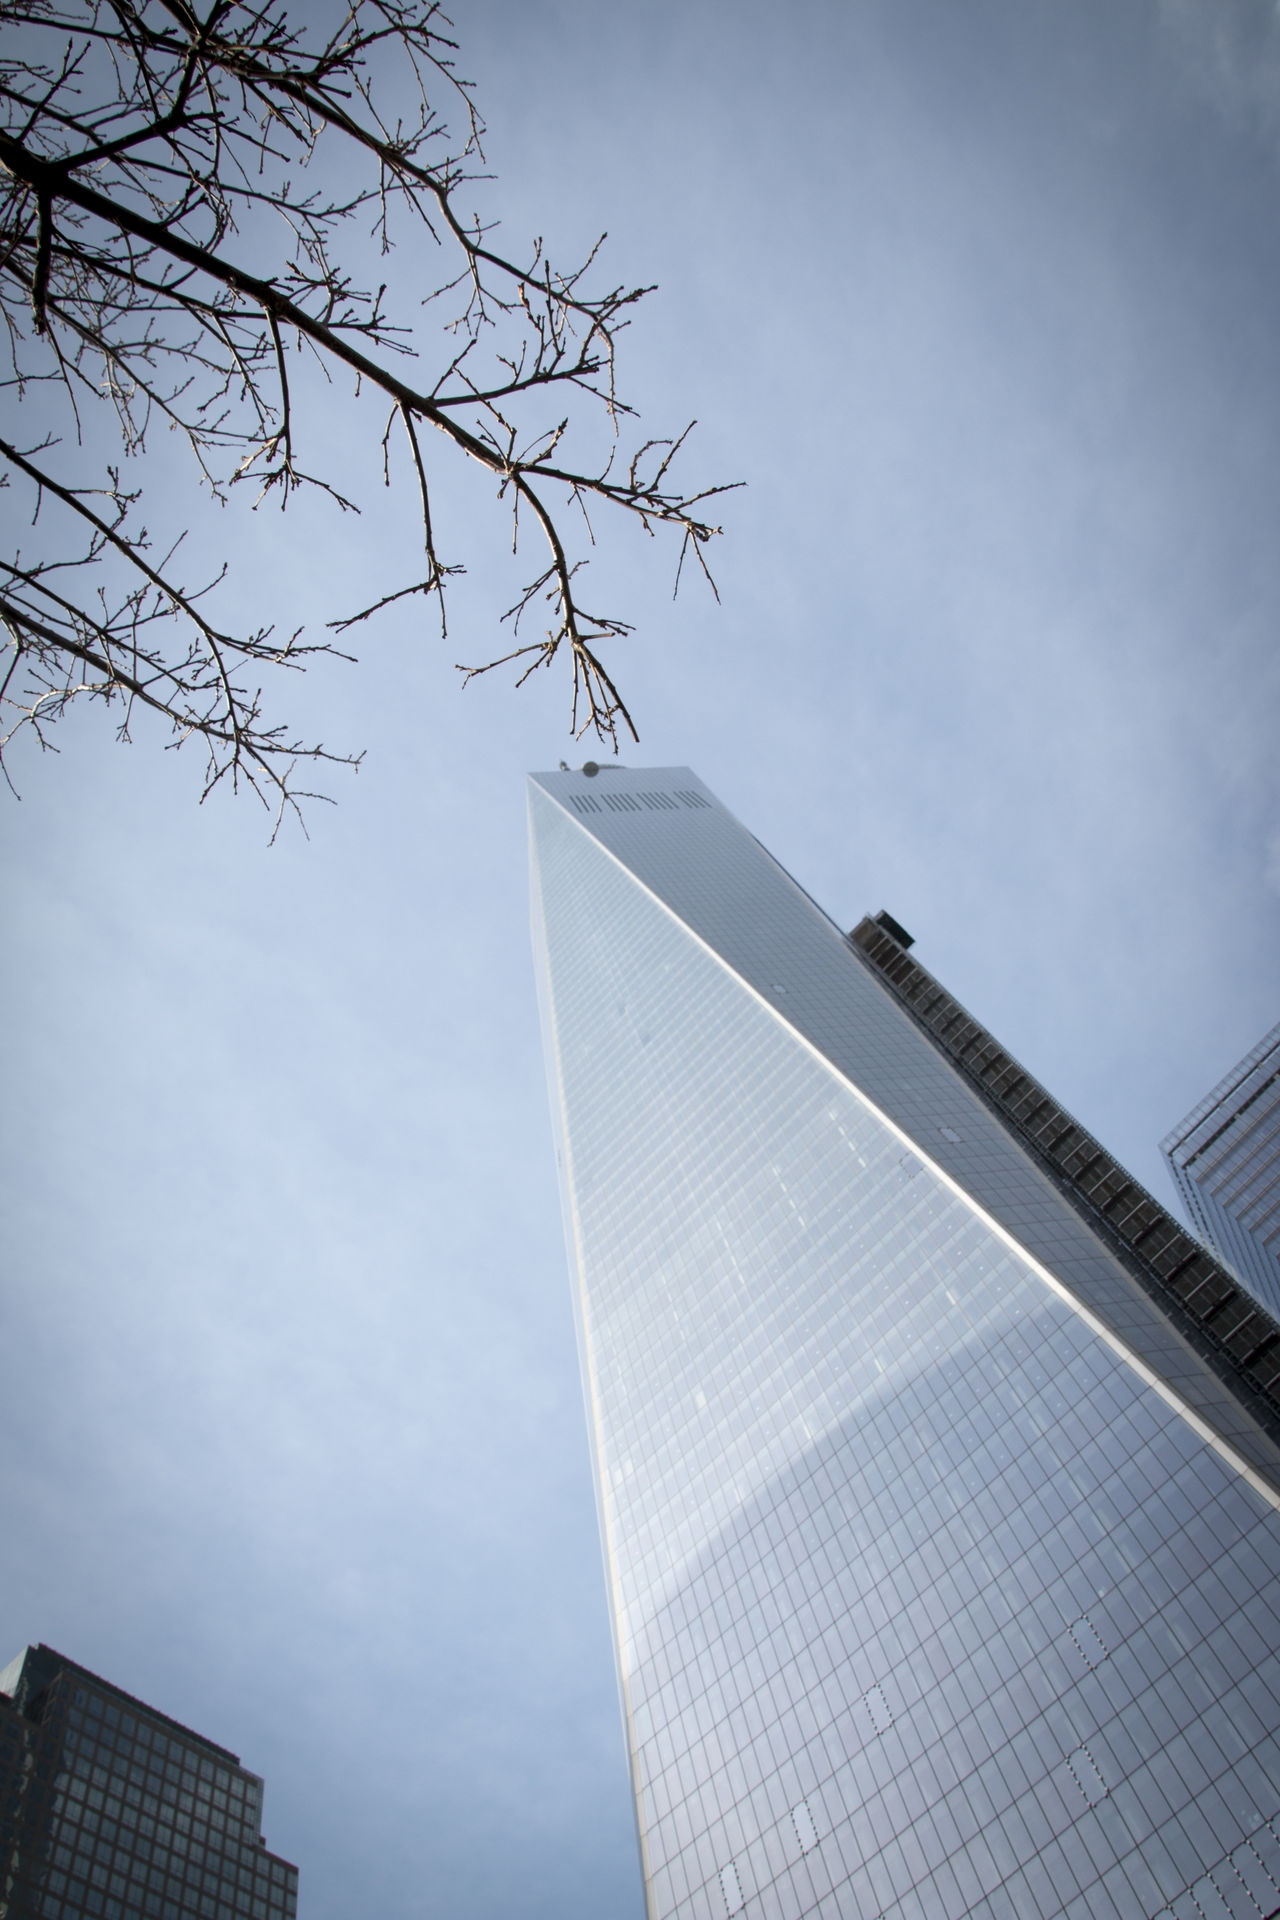 South Manhattan Ground Zero, NYC New York WTC One World Trade Center World Trade Center